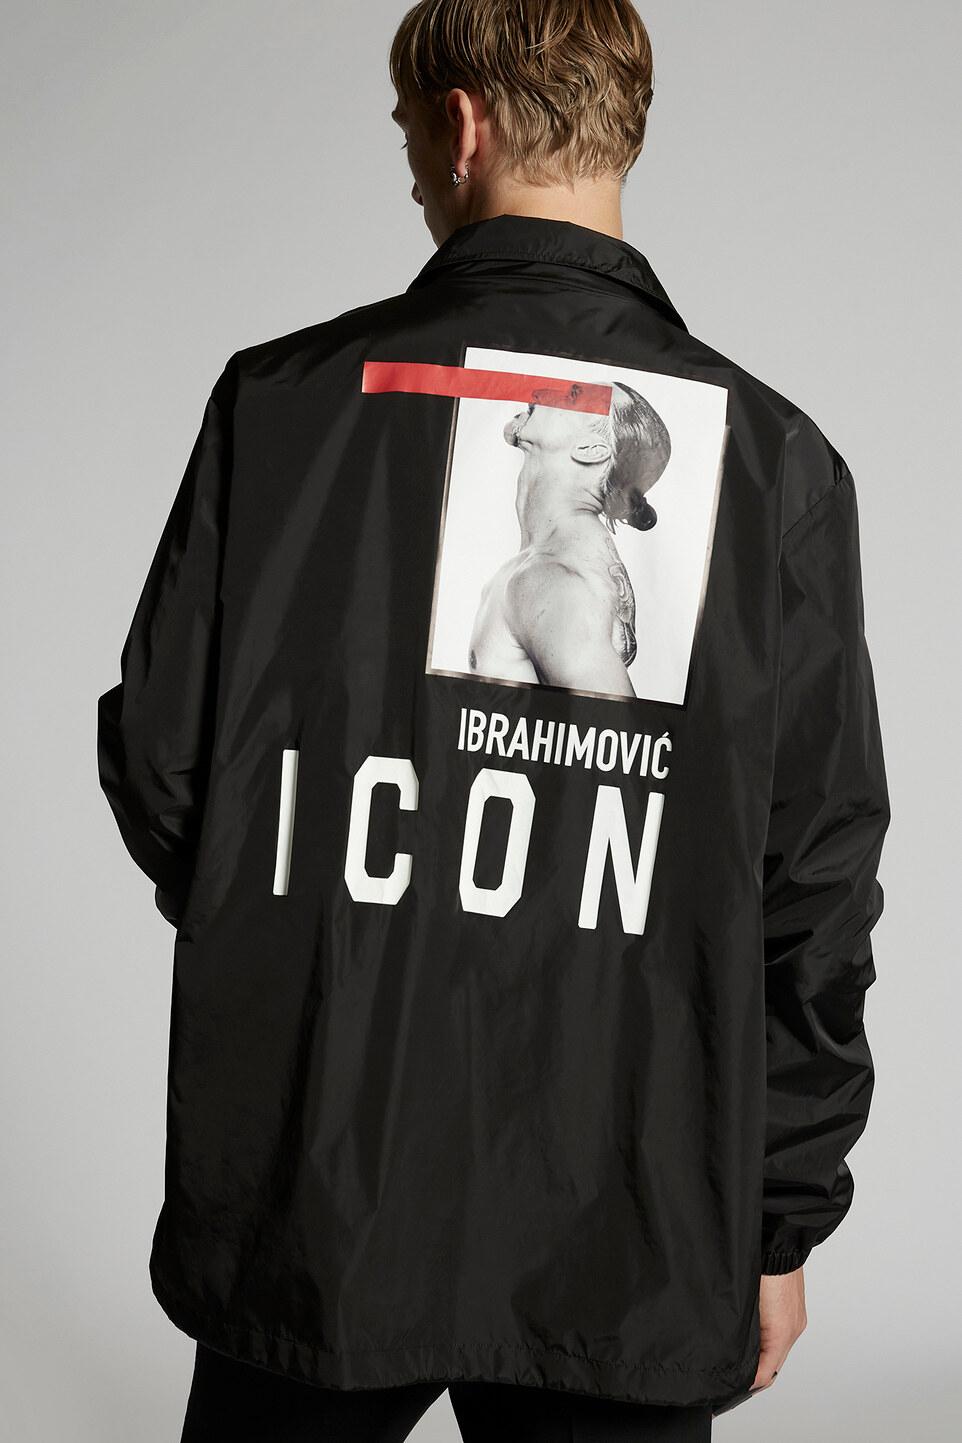 DSQUARED2 x Zlatan Ibrahimovic